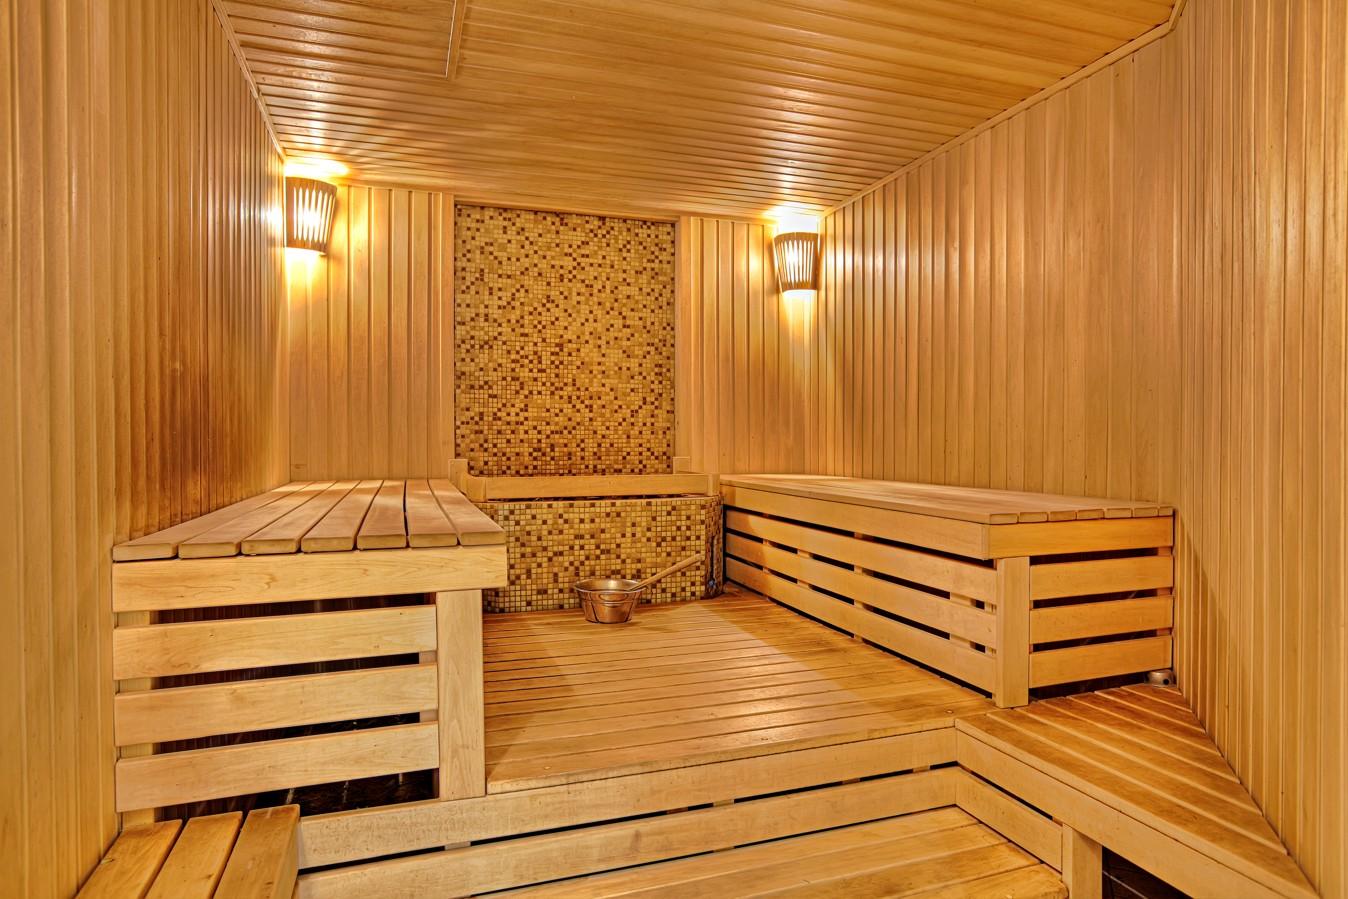 Монтаж панелей из дерева в бане